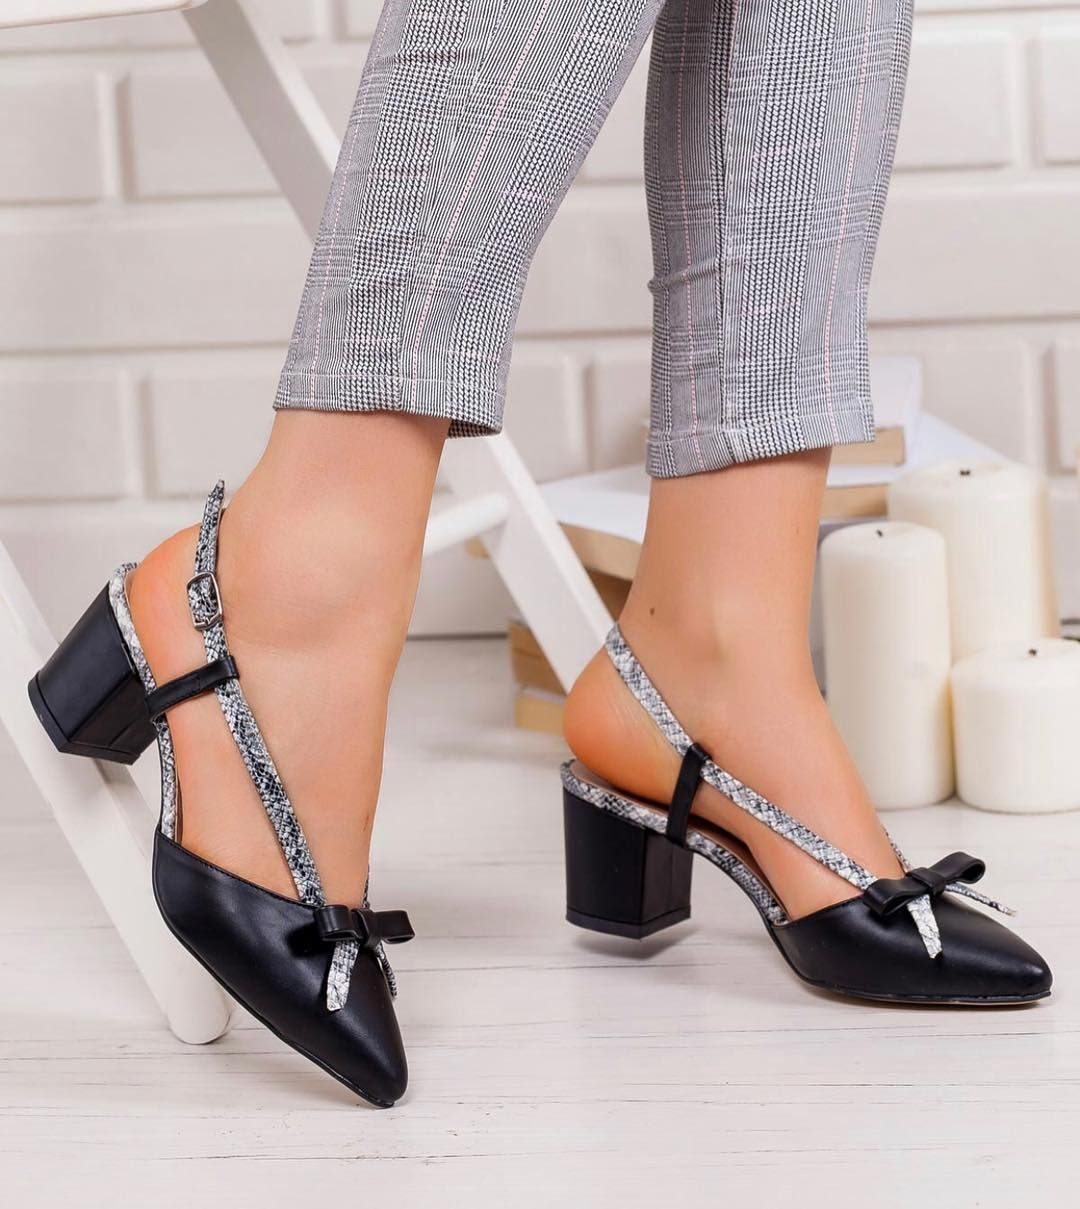 Urun Adi Athena Fiyat 109 90 Tl Topuk Boyu 6 Cm Whatsapp 0533 133 62 68 Www Takunyalar Com Web Sayfamizdan Kredi Kartiyla Olusturacag Heels Mule Shoe Fashion